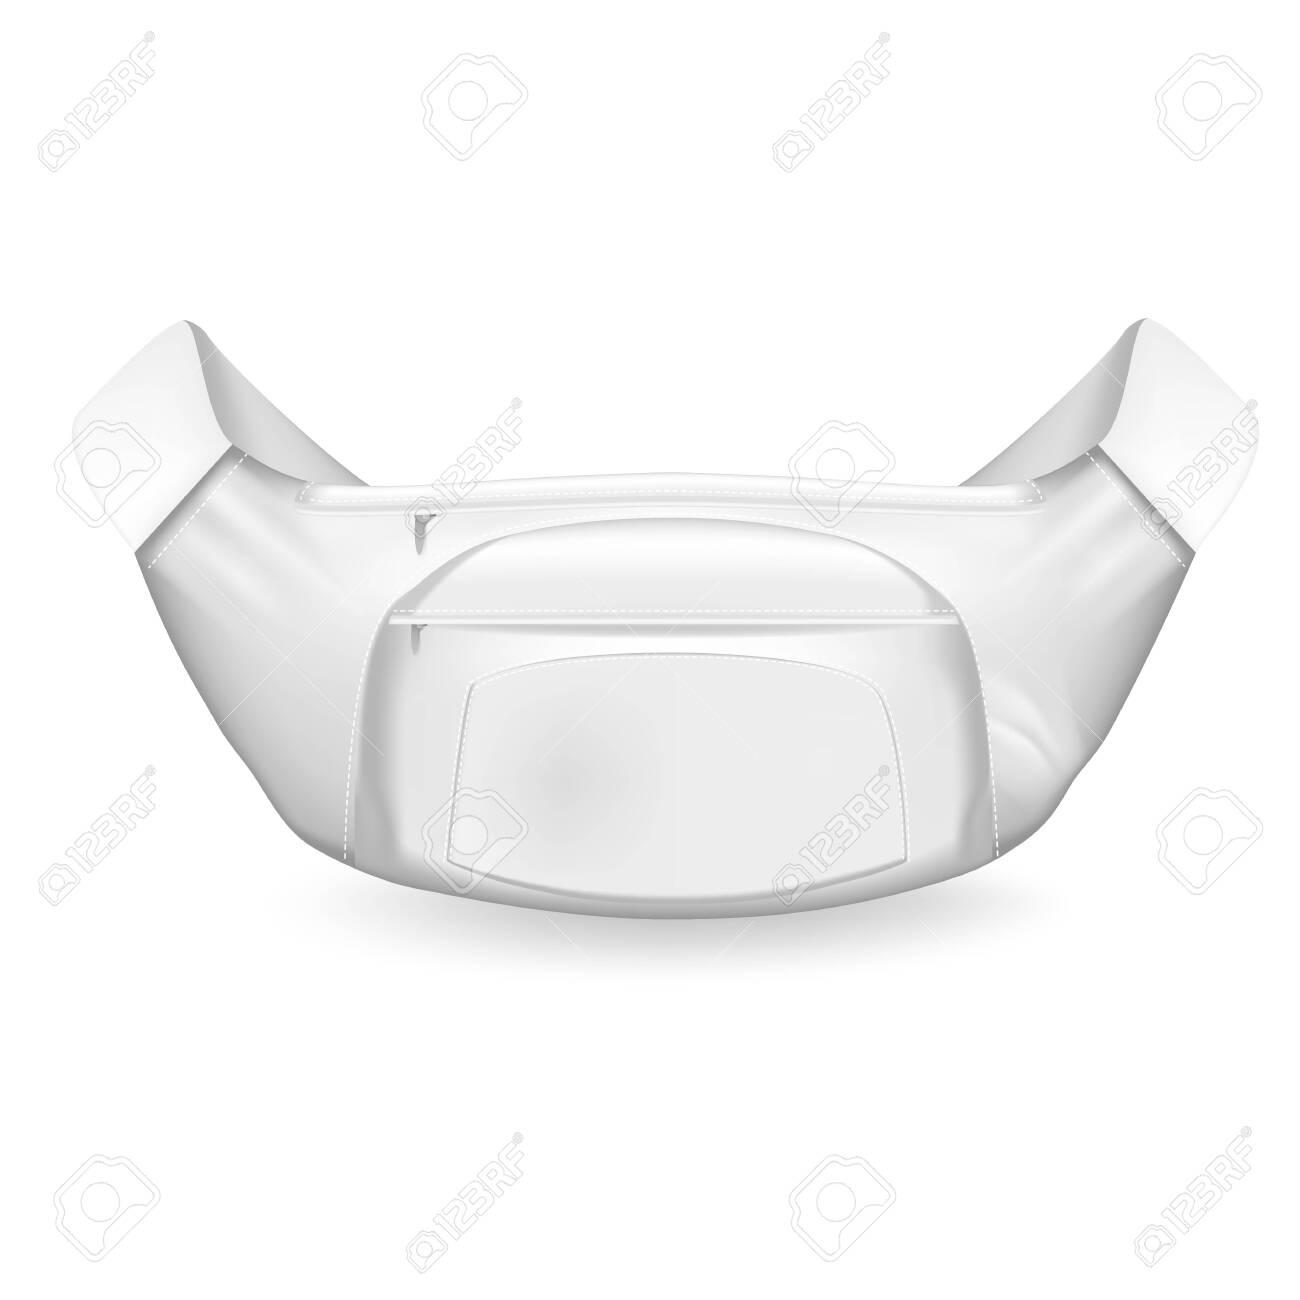 Waist bag. Modern mockup white waist bag with elegant protruding zip pocket built in center fashionable sports design sports travel close ups realistic graphics. Vector mockup style. - 146696972